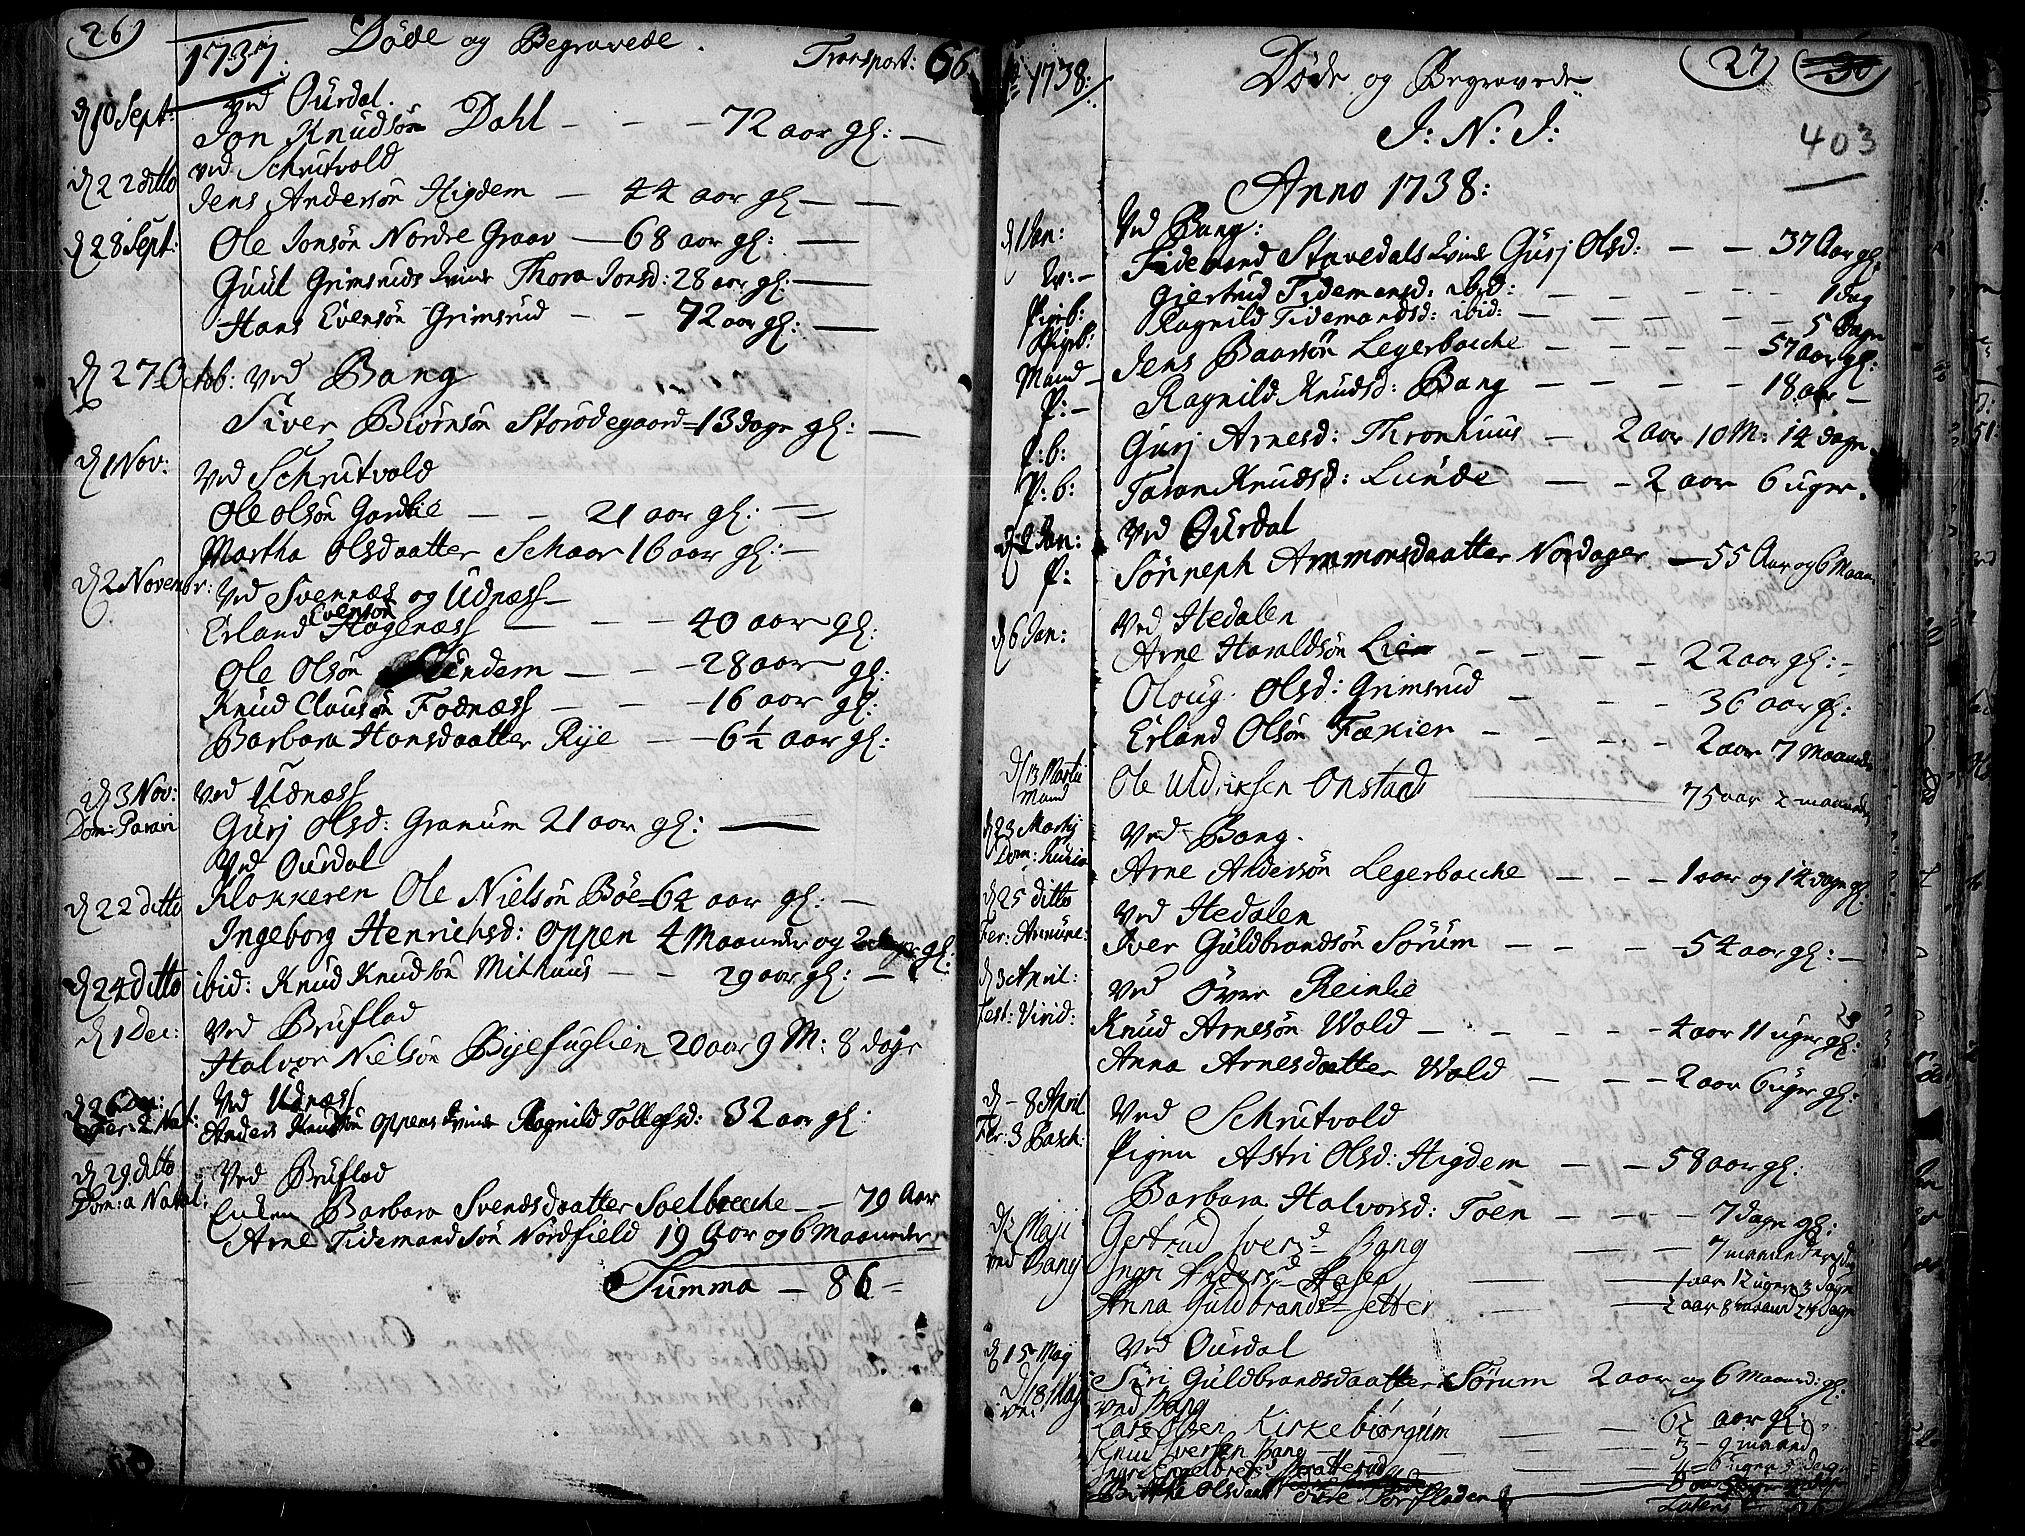 SAH, Aurdal prestekontor, Ministerialbok nr. 4, 1730-1762, s. 26-27